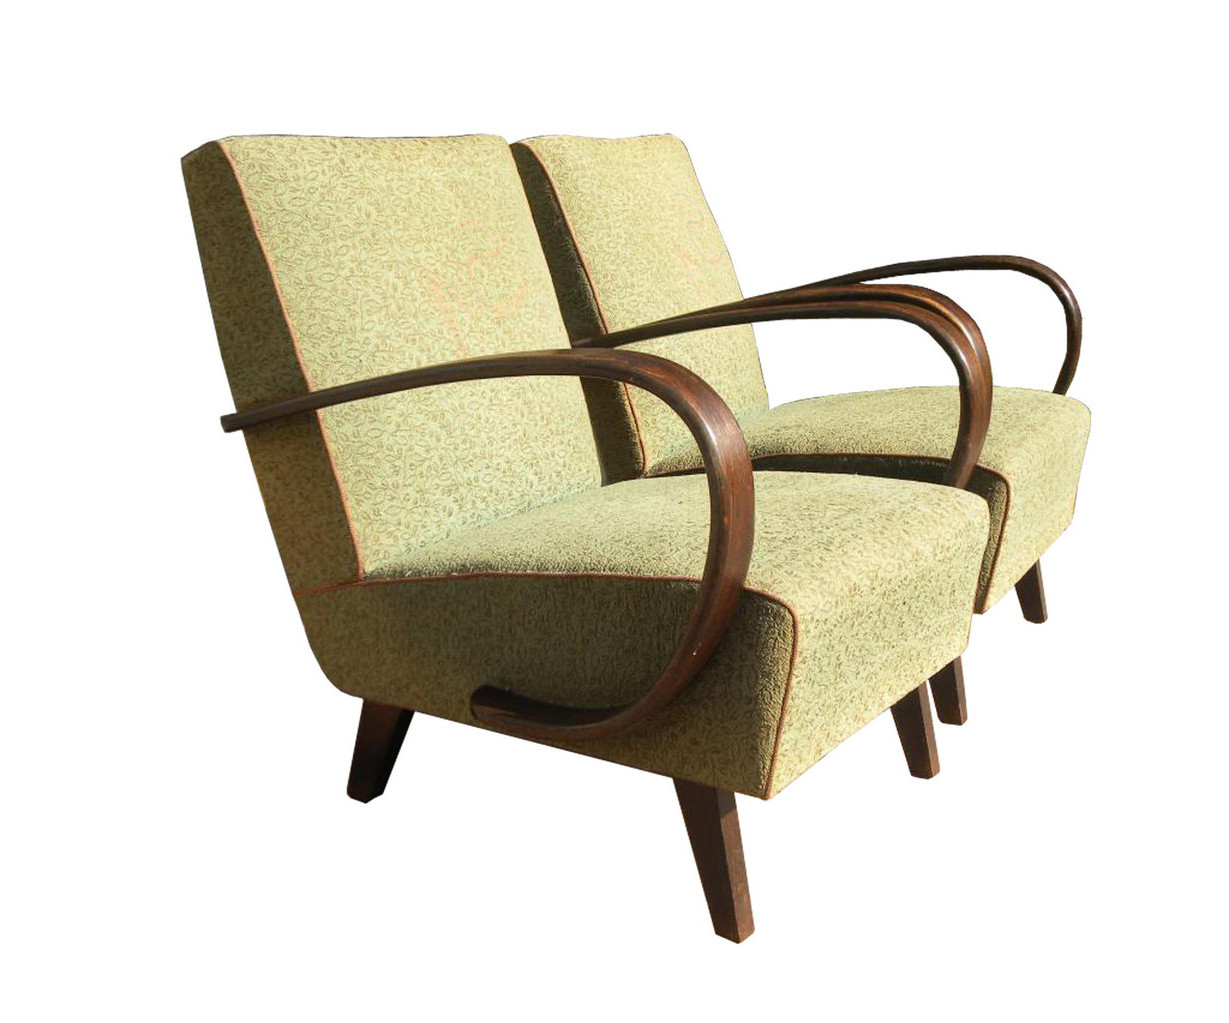 Poltrone Anni 30 Italian Vintage Sofa